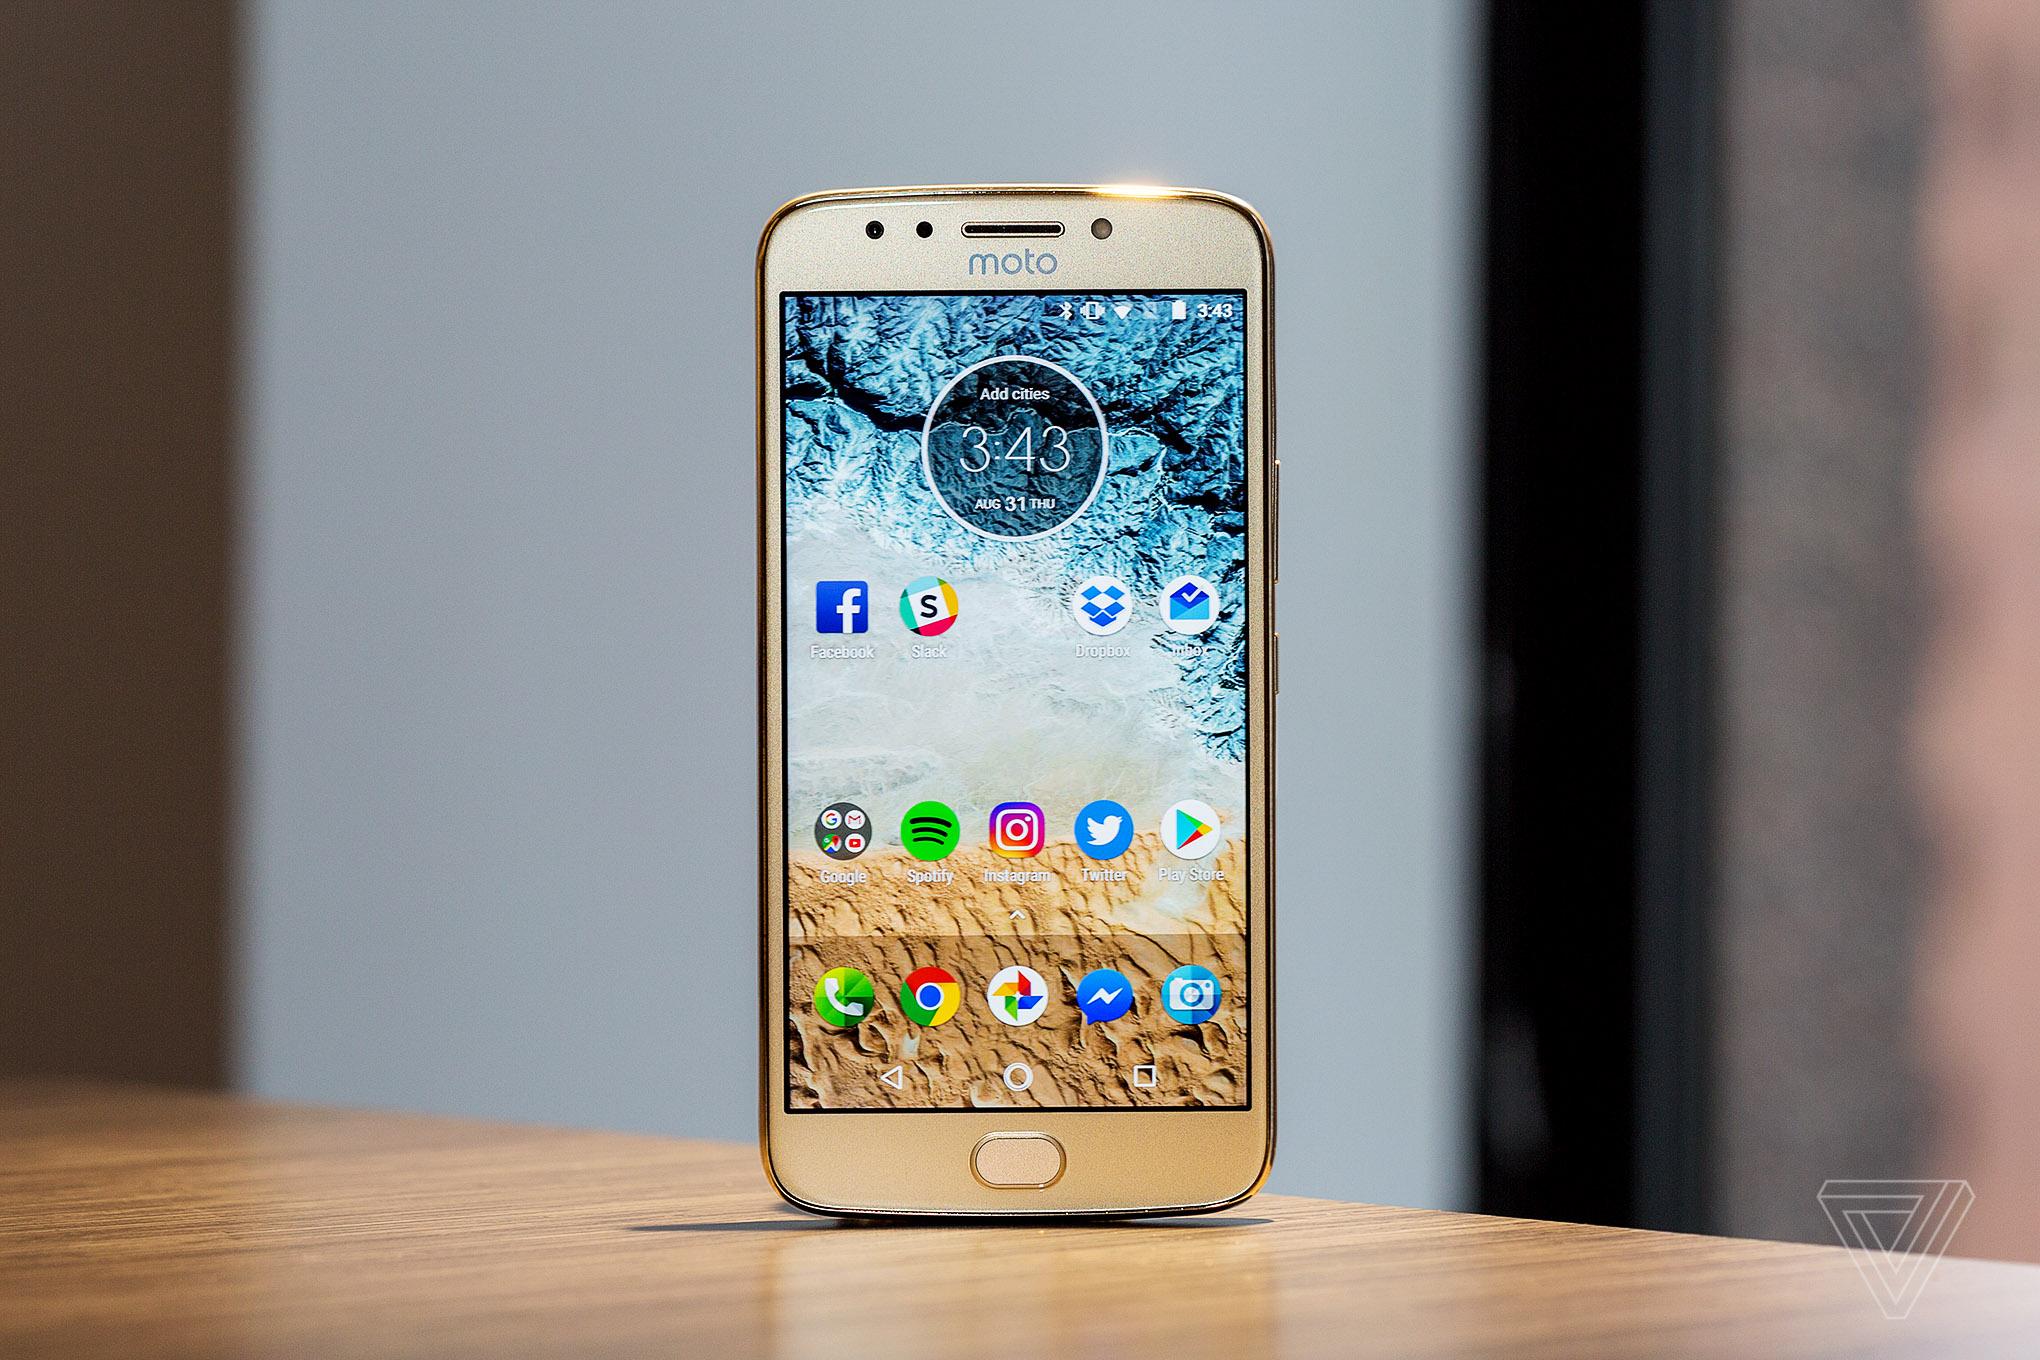 Motorola Moto E4 Plus review: a utilitarian workhorse - The